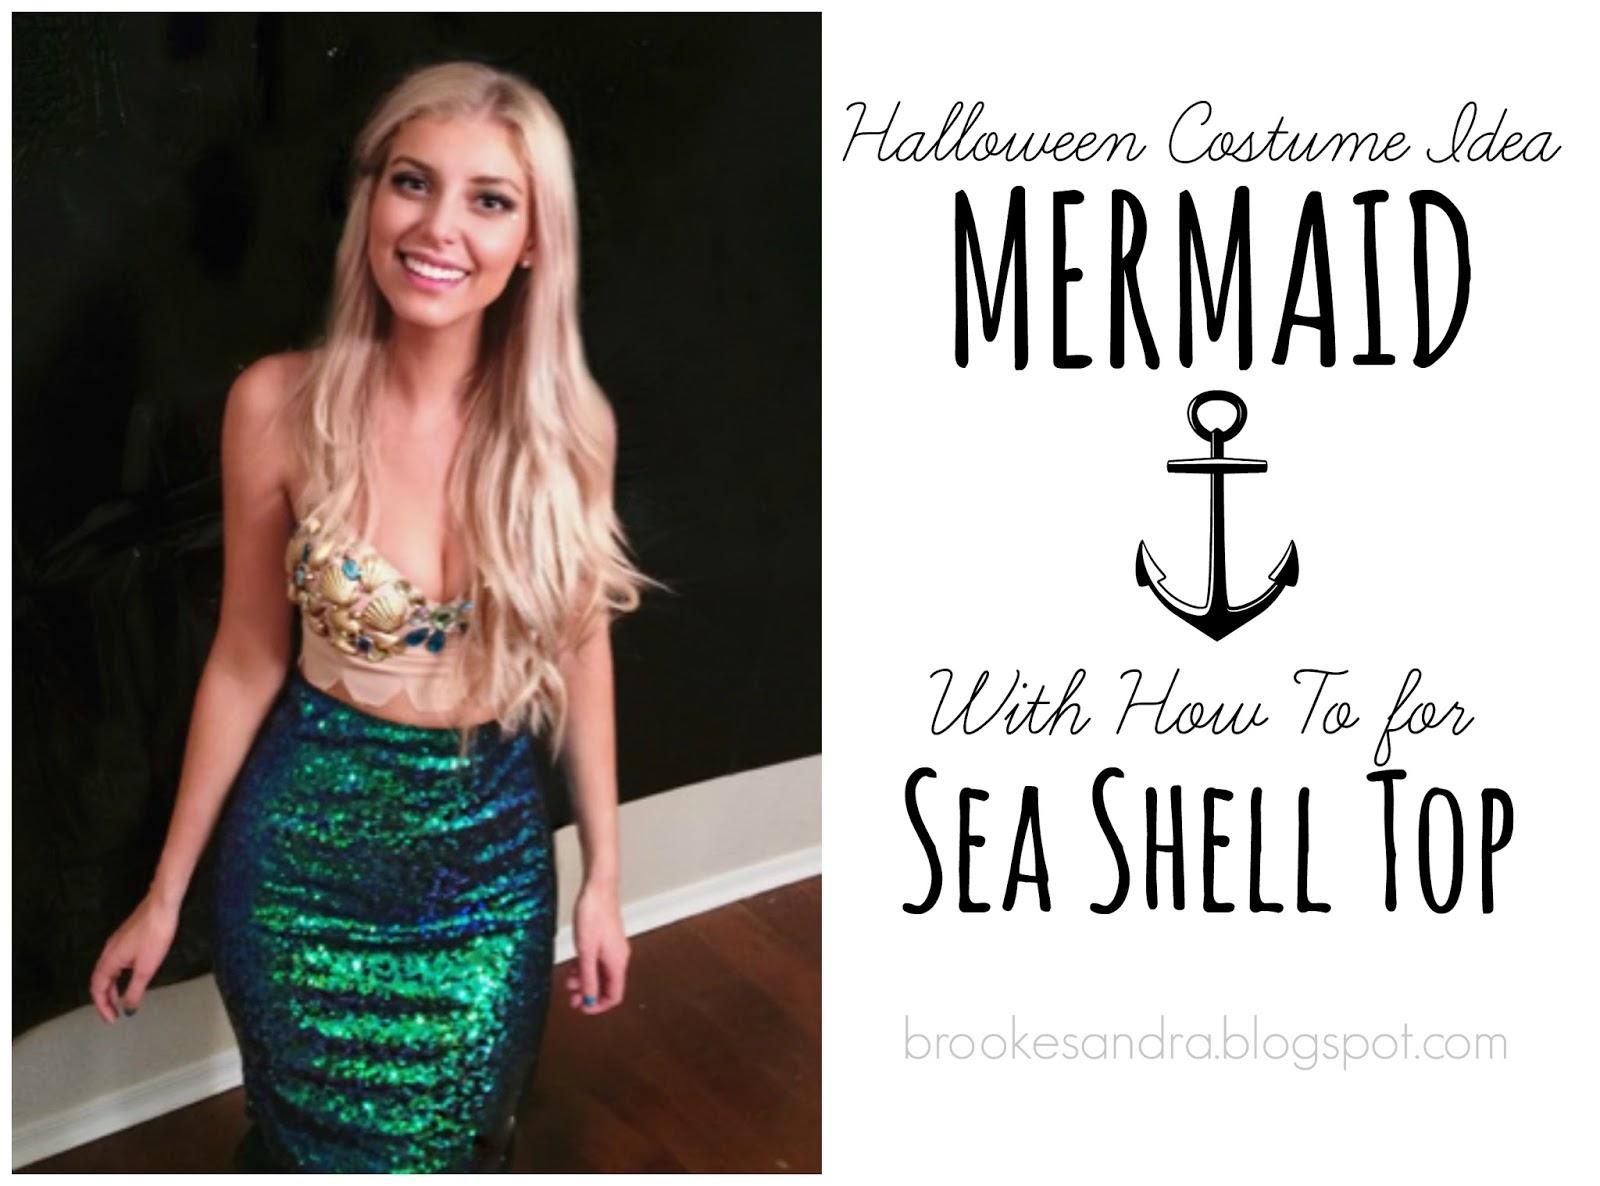 Brooke sandra blog life diy inspiration mermaid costume oct 26 2015 solutioingenieria Choice Image